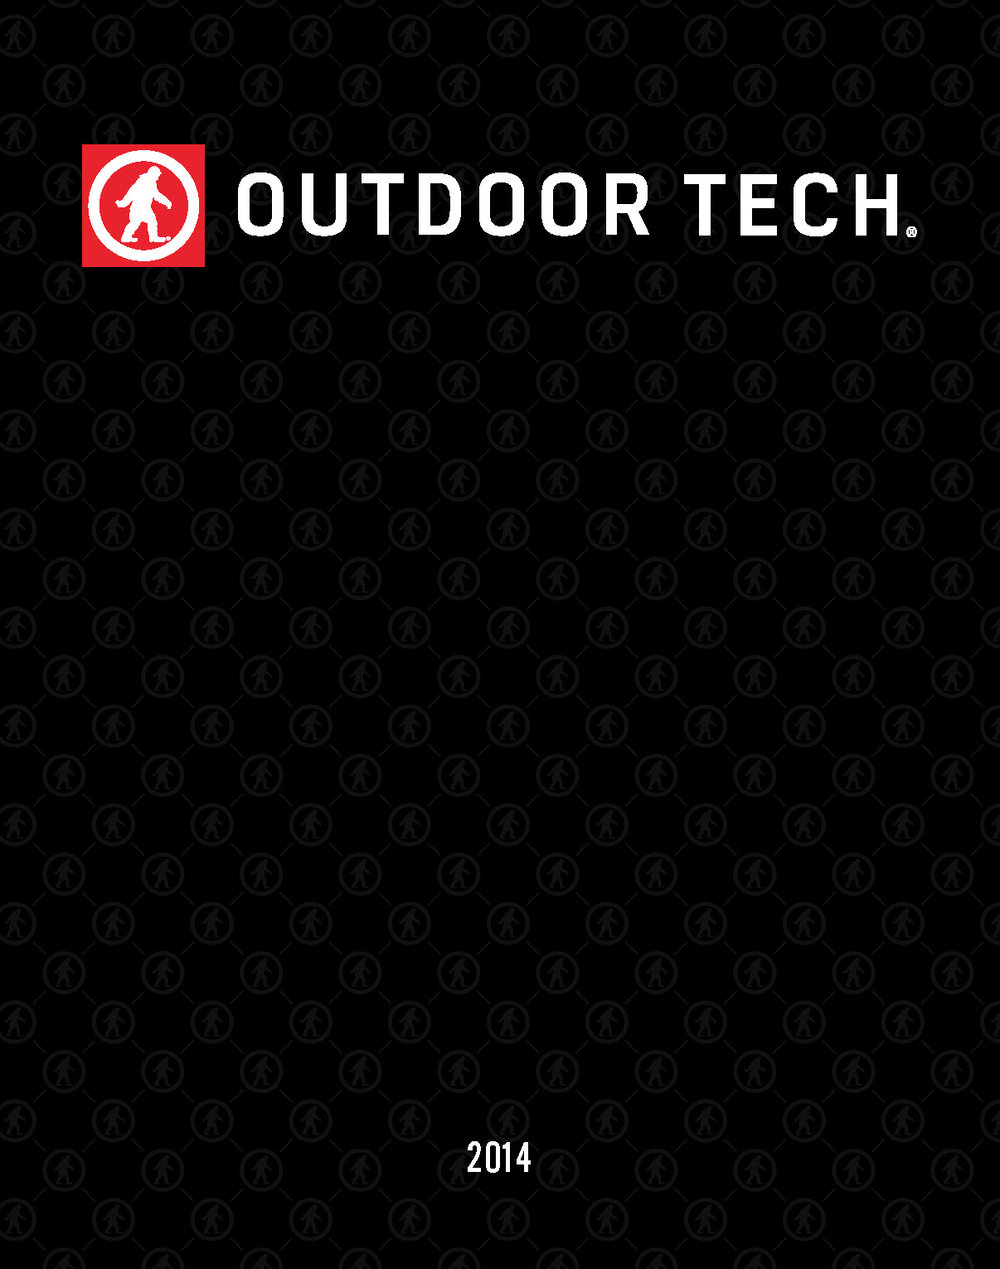 ODT_2014_Page_01.jpg